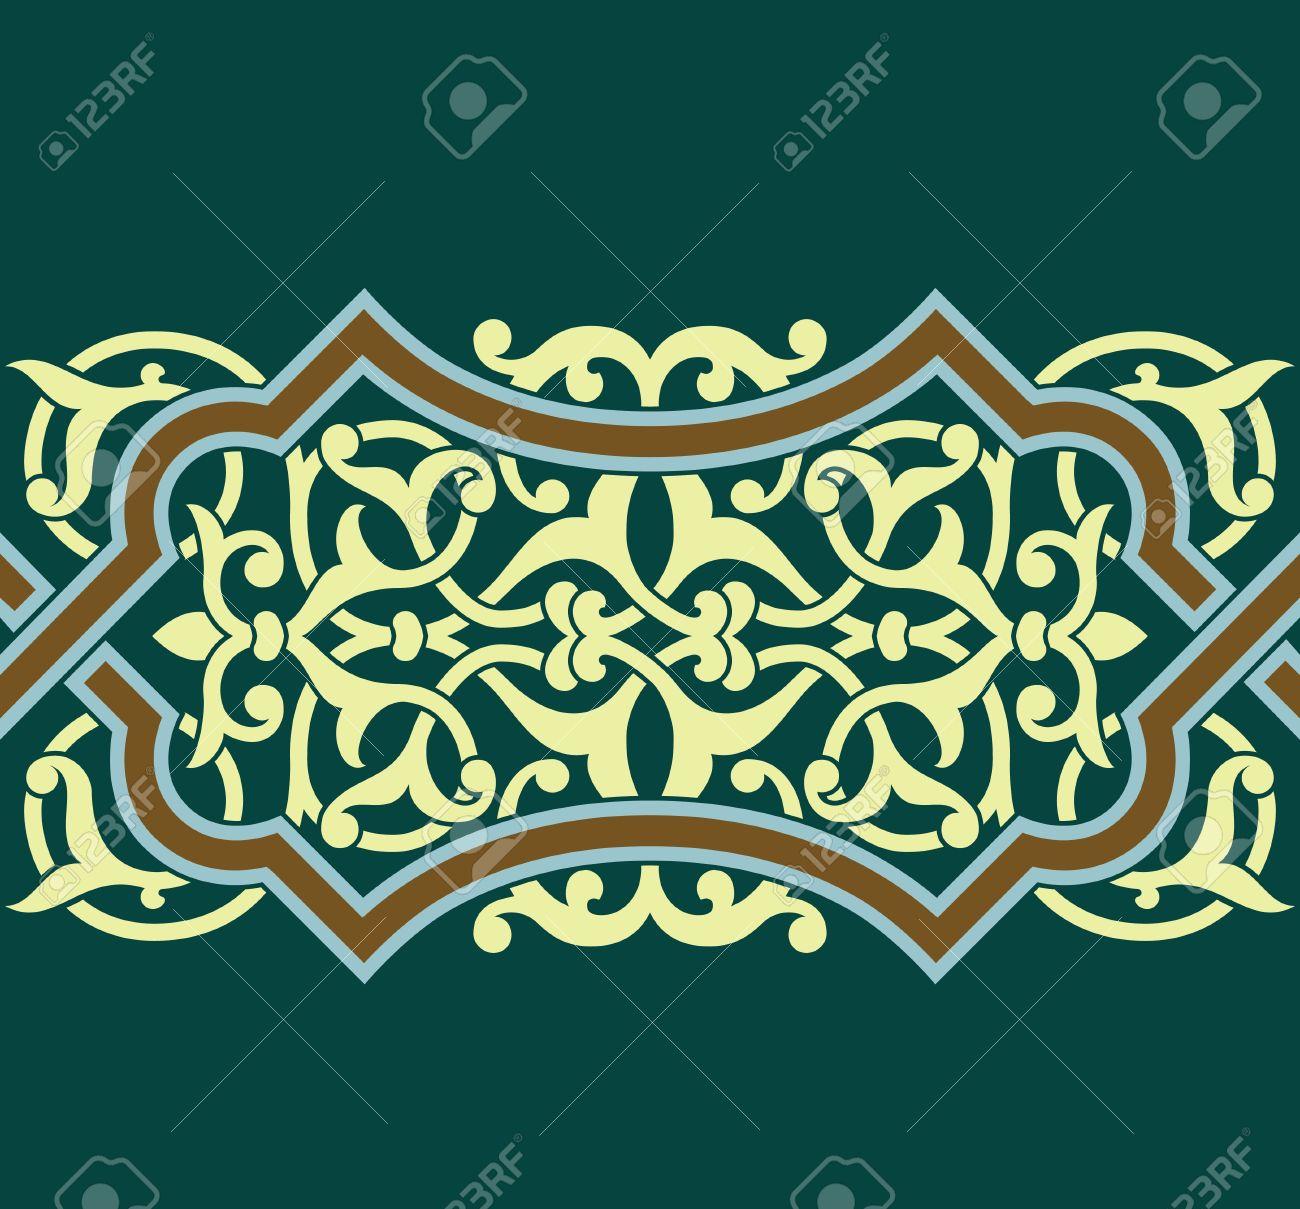 Traditional Arabic Border Stock Vector - 15559930